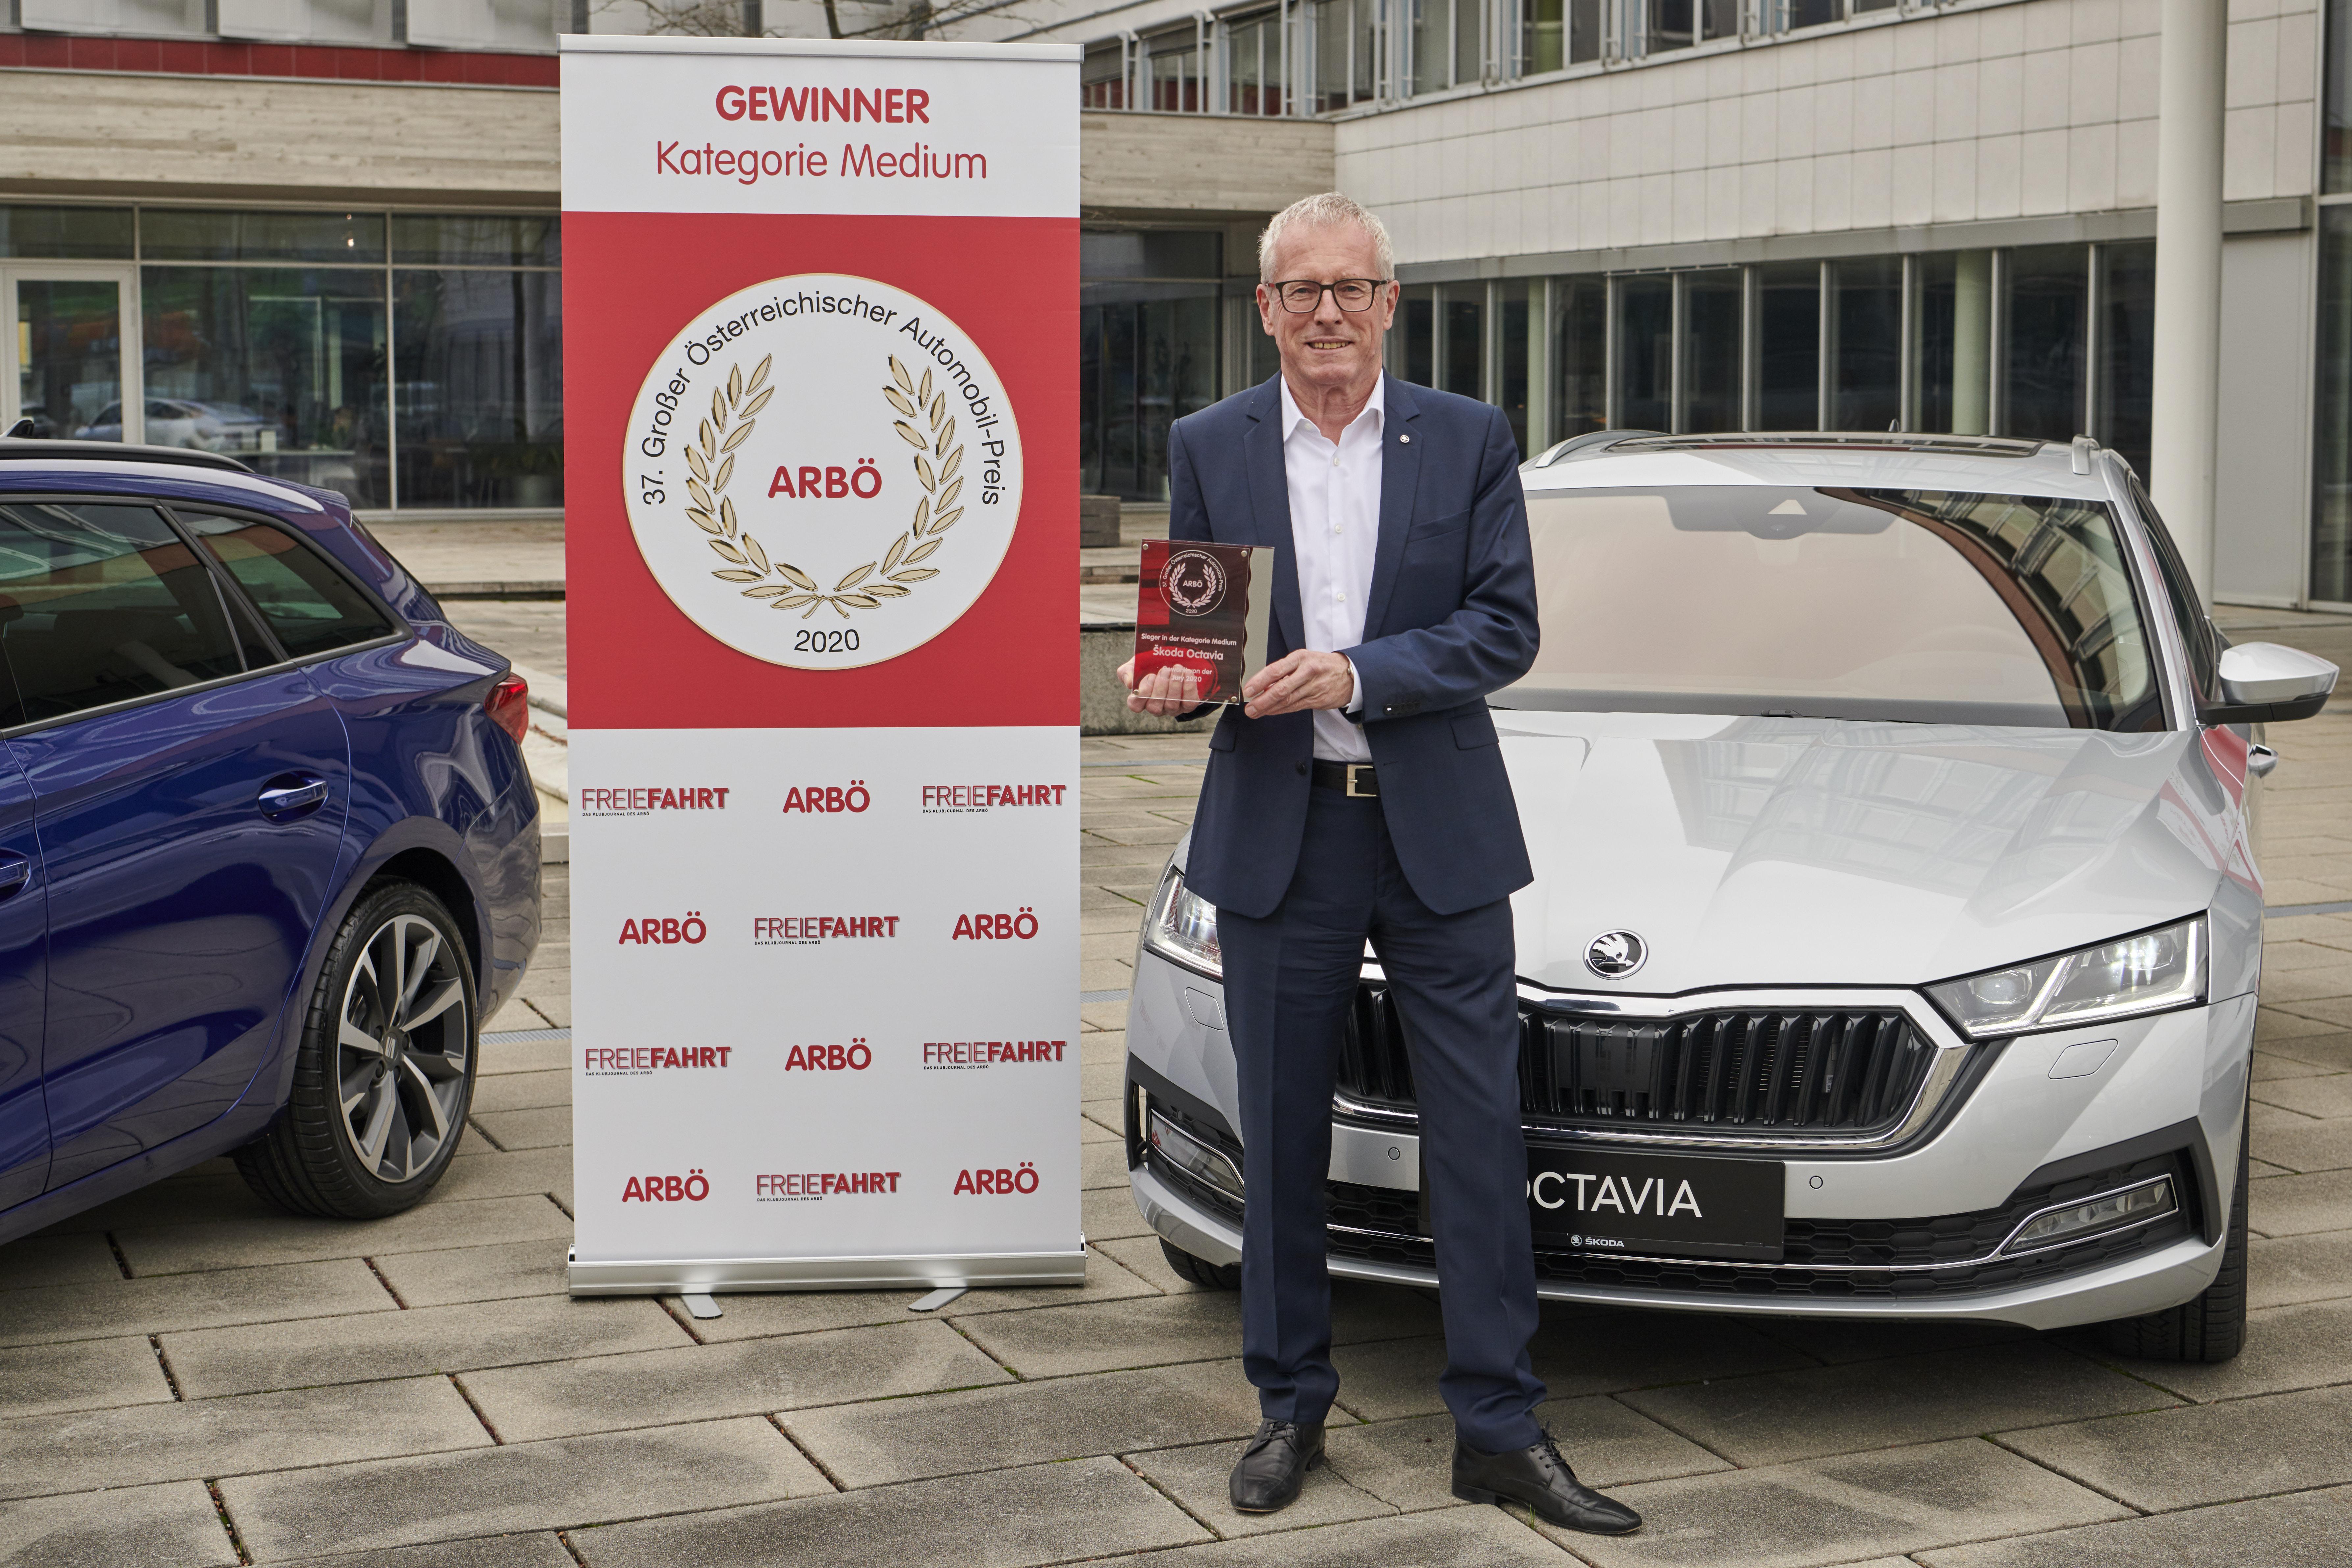 All-new SKODA OCTAVIA wins Austrian prestigious car award - Image 1